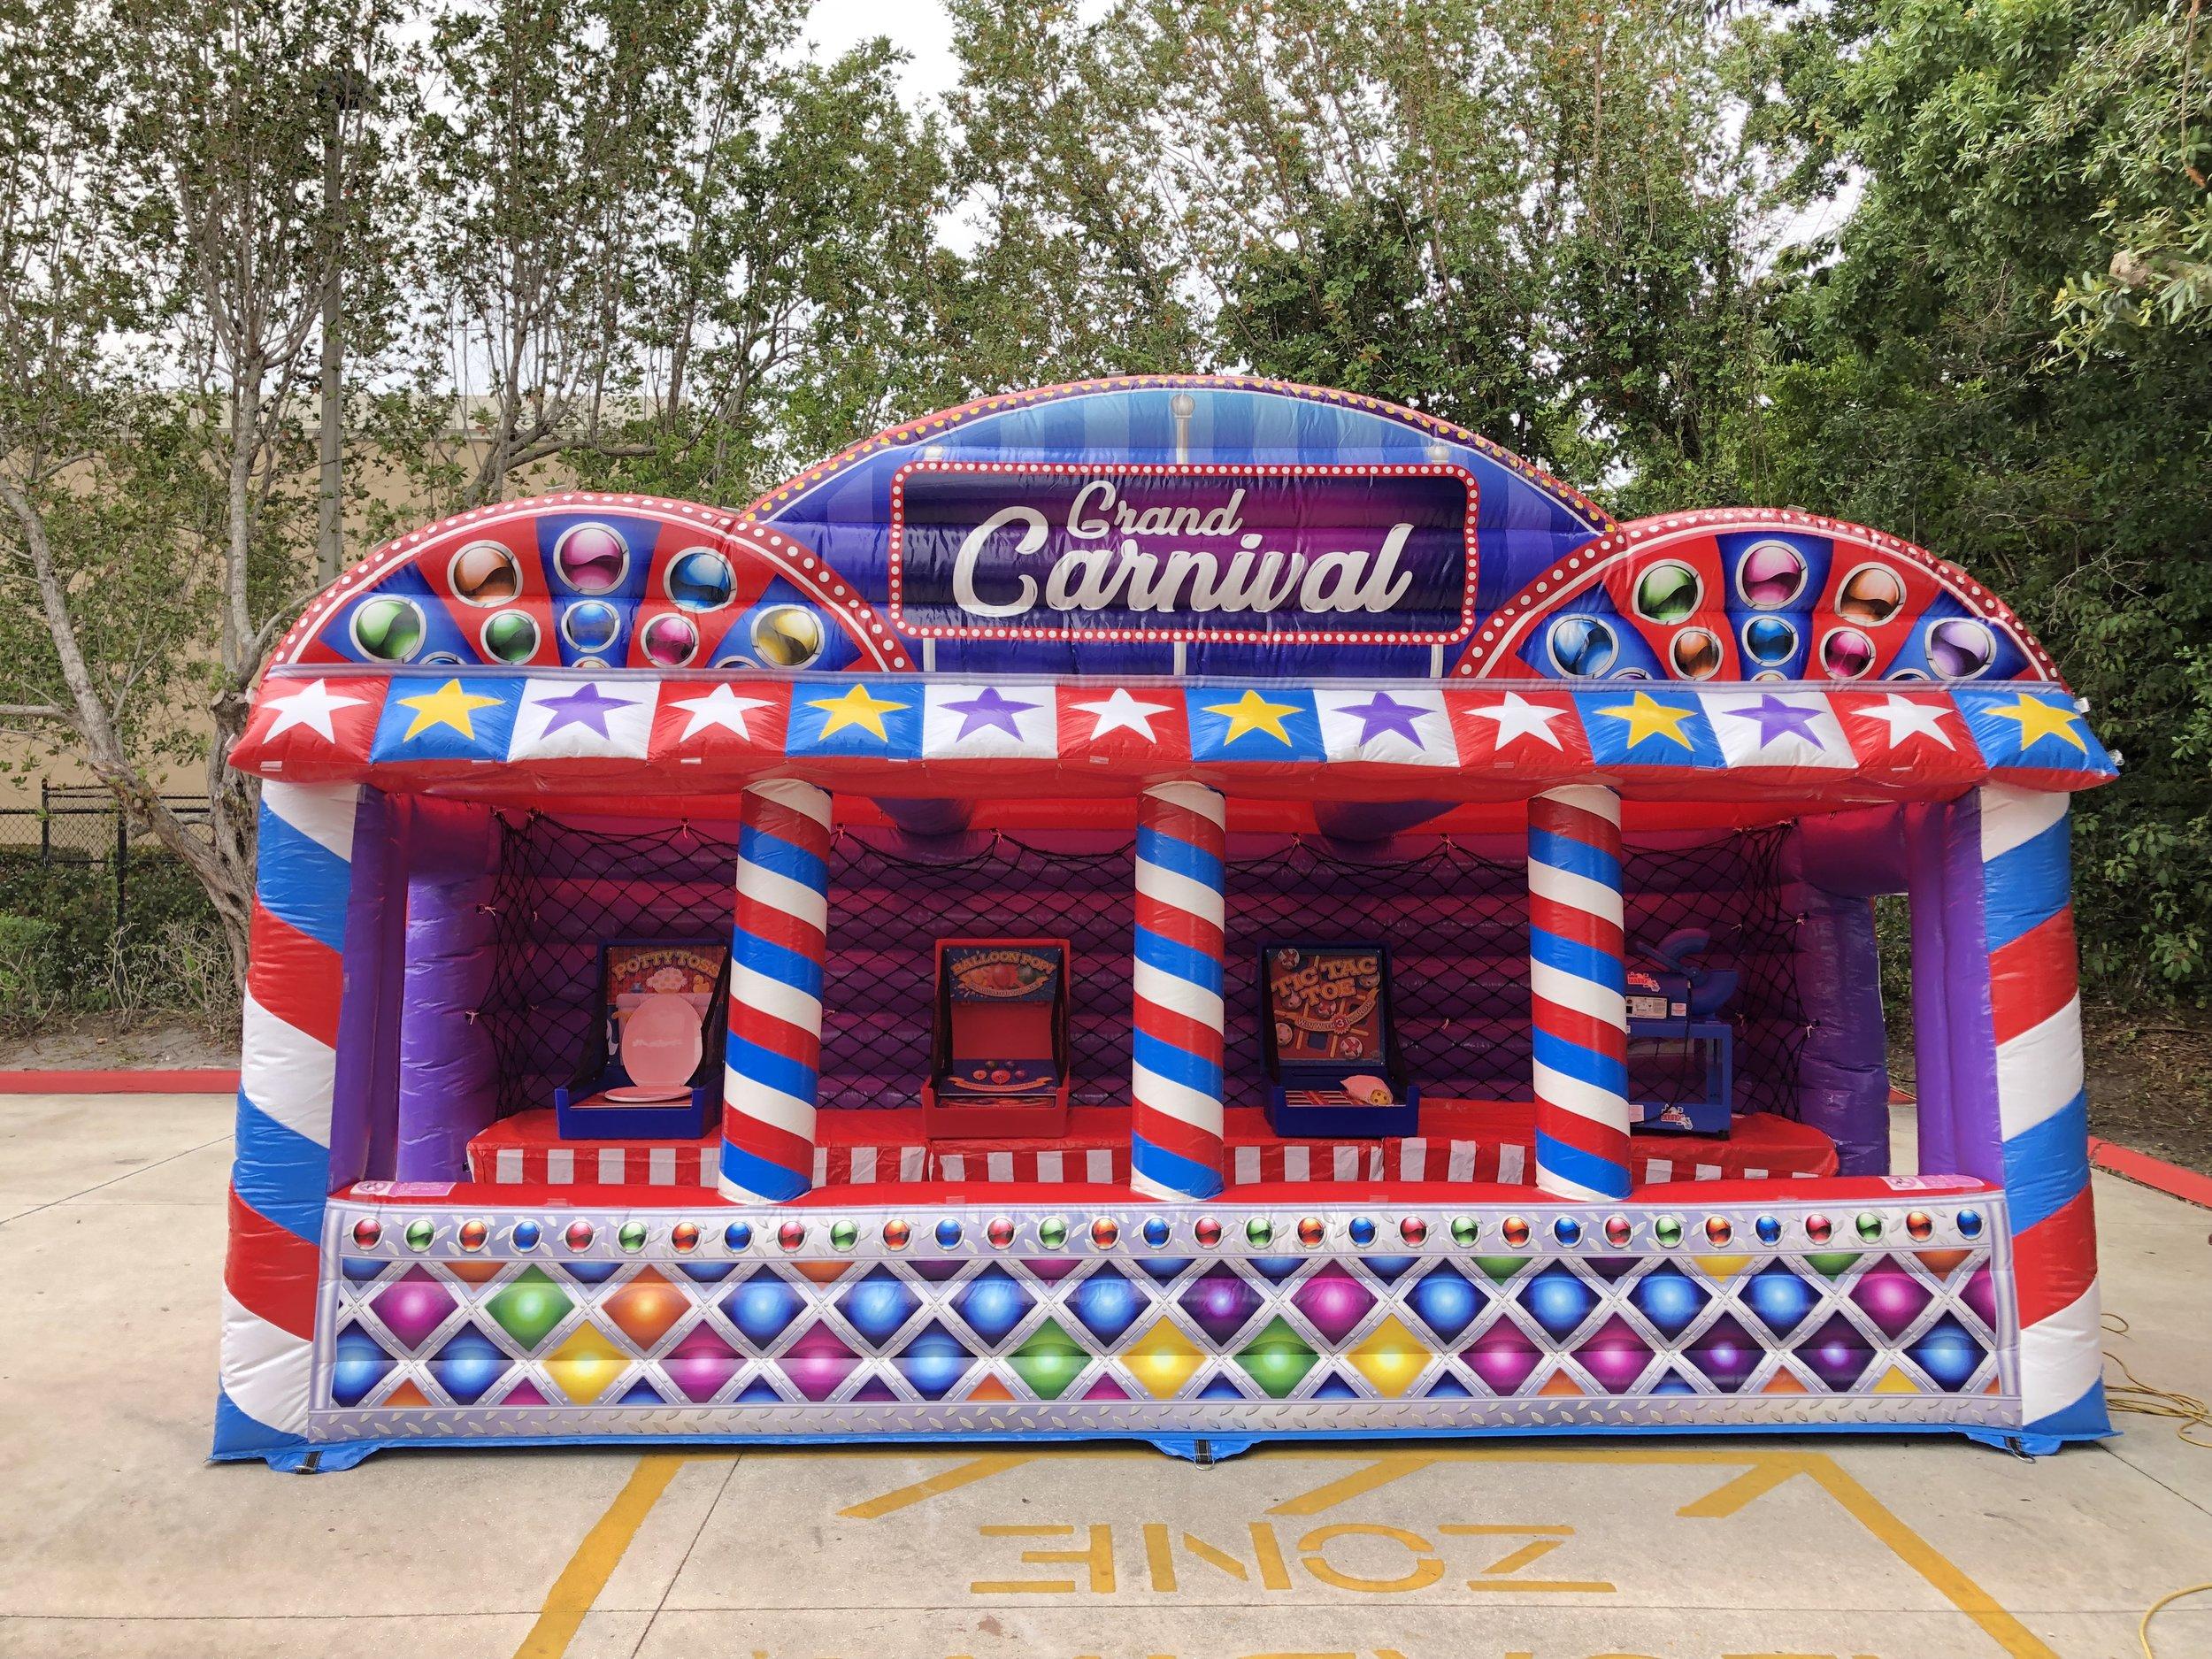 grandmidway-carnivalgame-circus-themedevents-partyrental-jupiterbouncehouse-hobesoundfacepainter-balloonartist.jpg